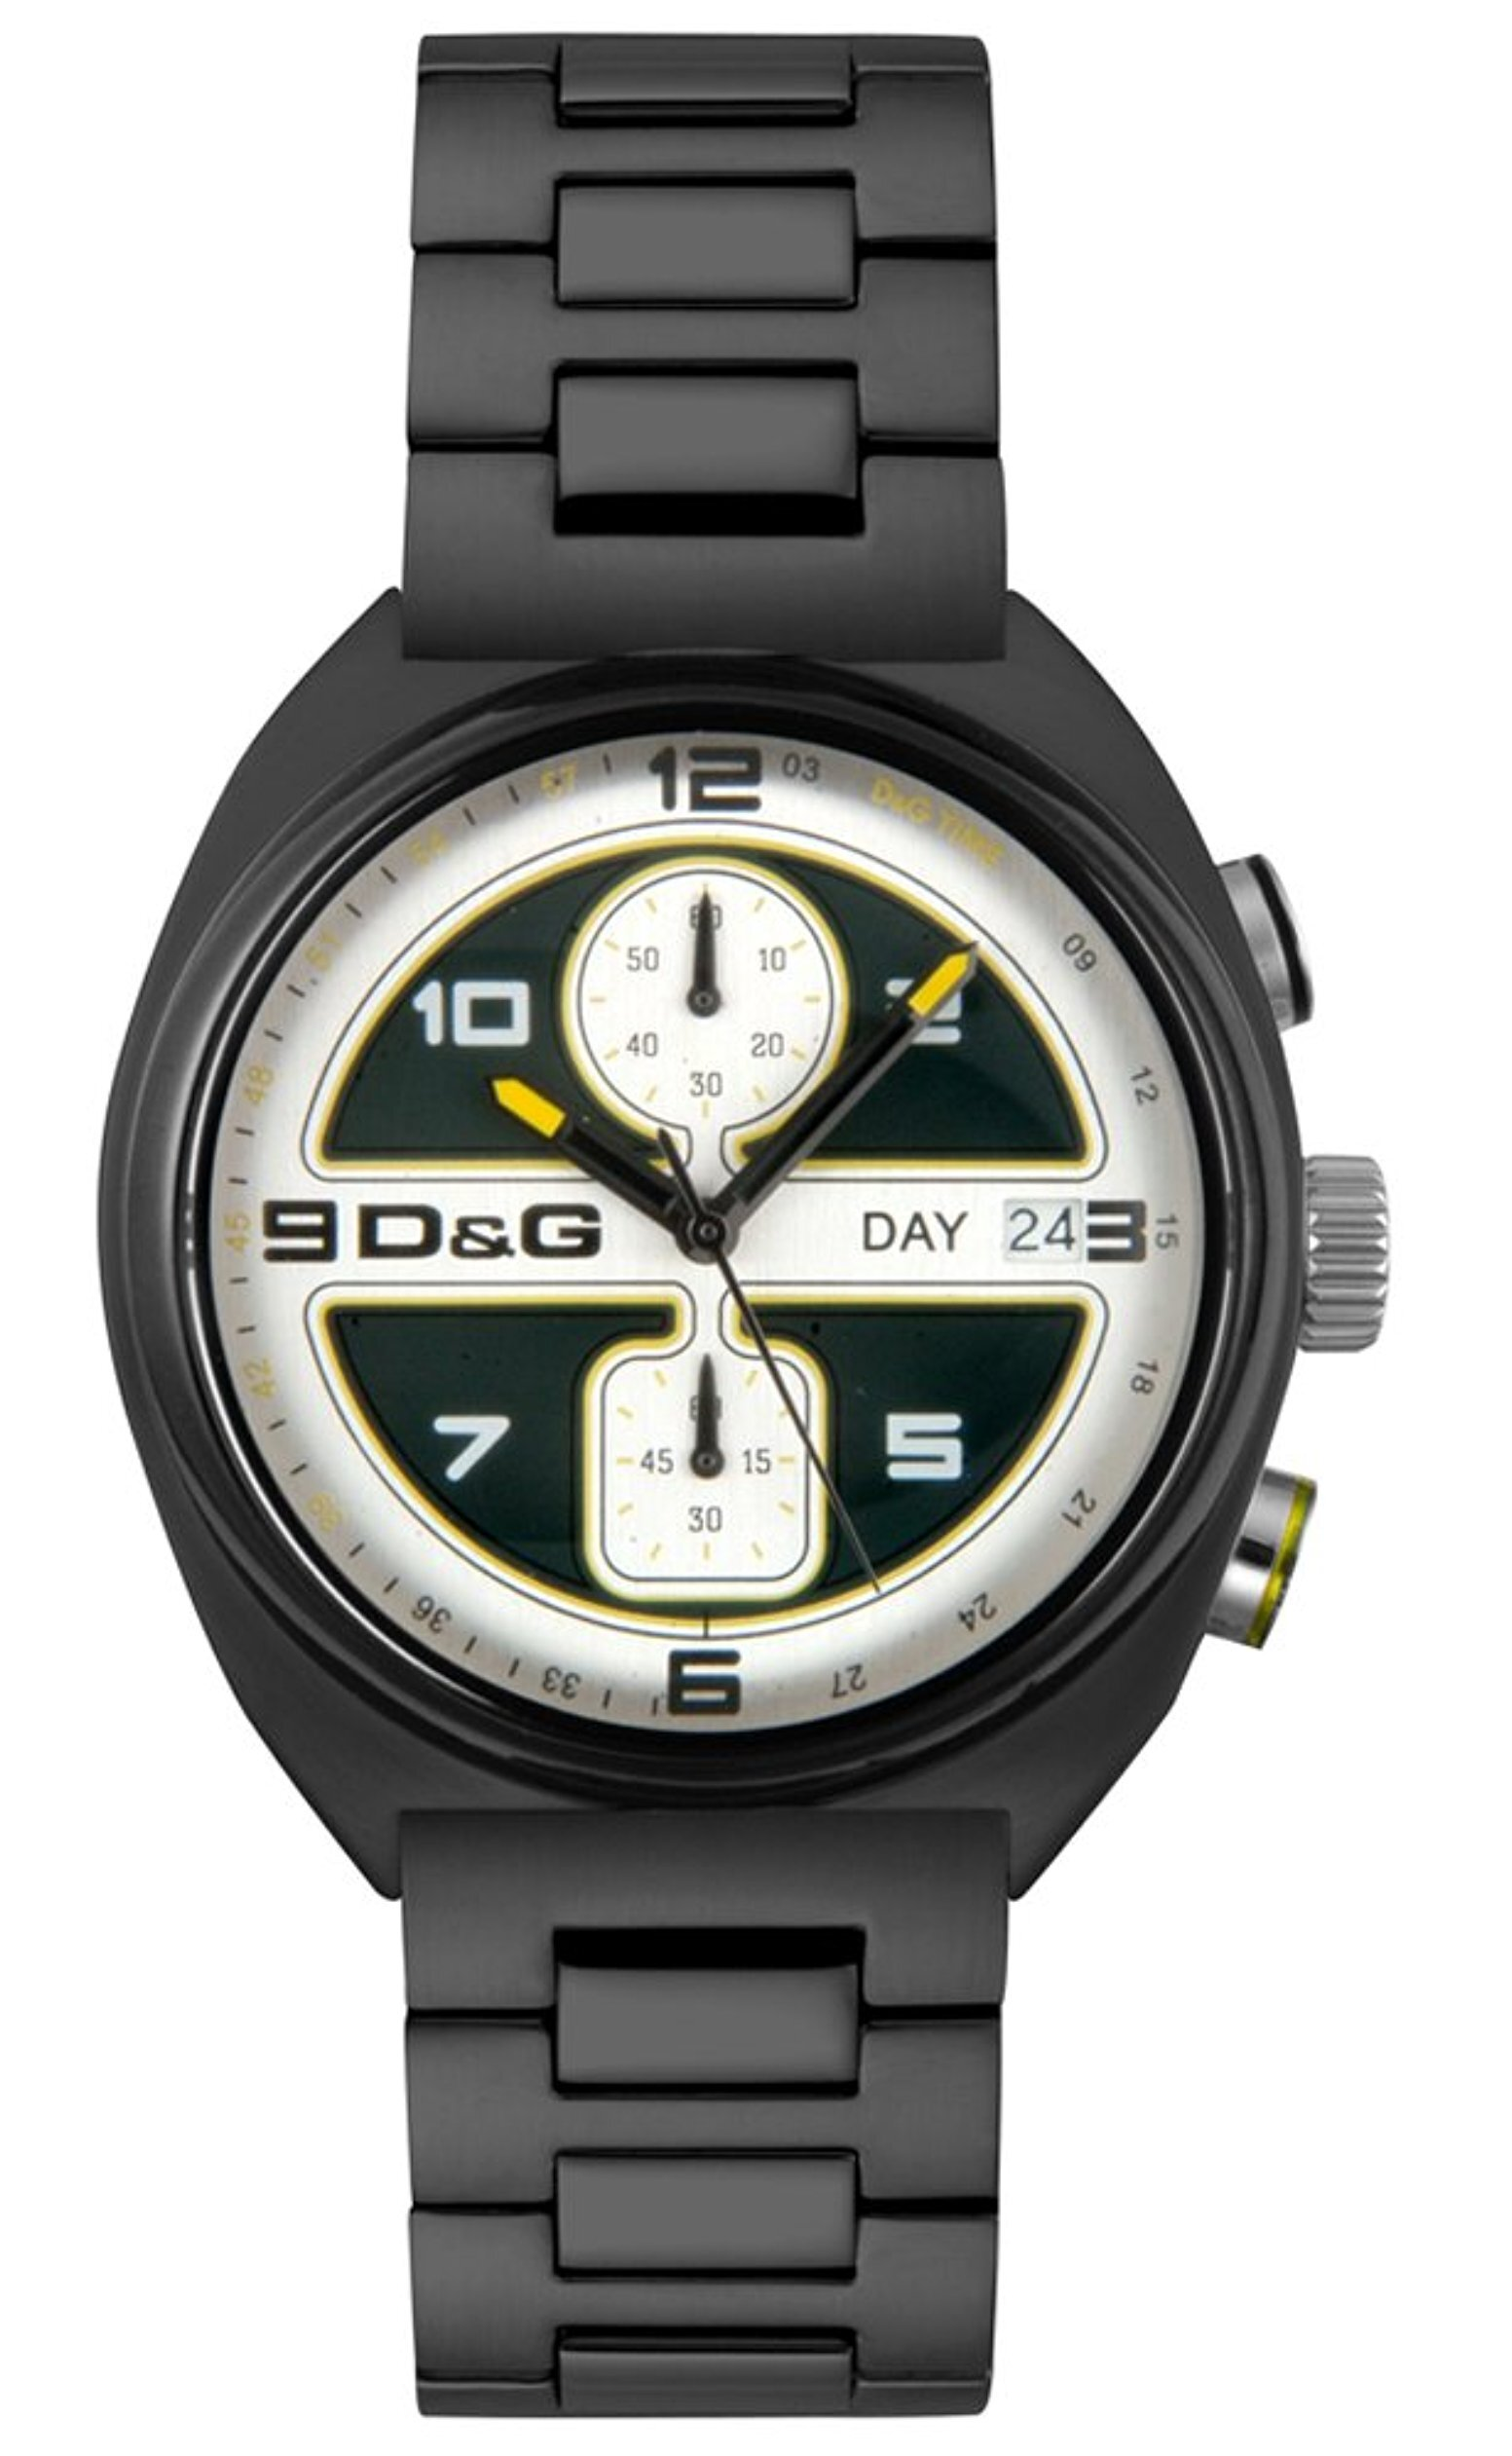 Dolce & Gabbana D&G Song Herreklokke DW0302 Sort/Stål Ø43 mm - Dolce & Gabbana D&G